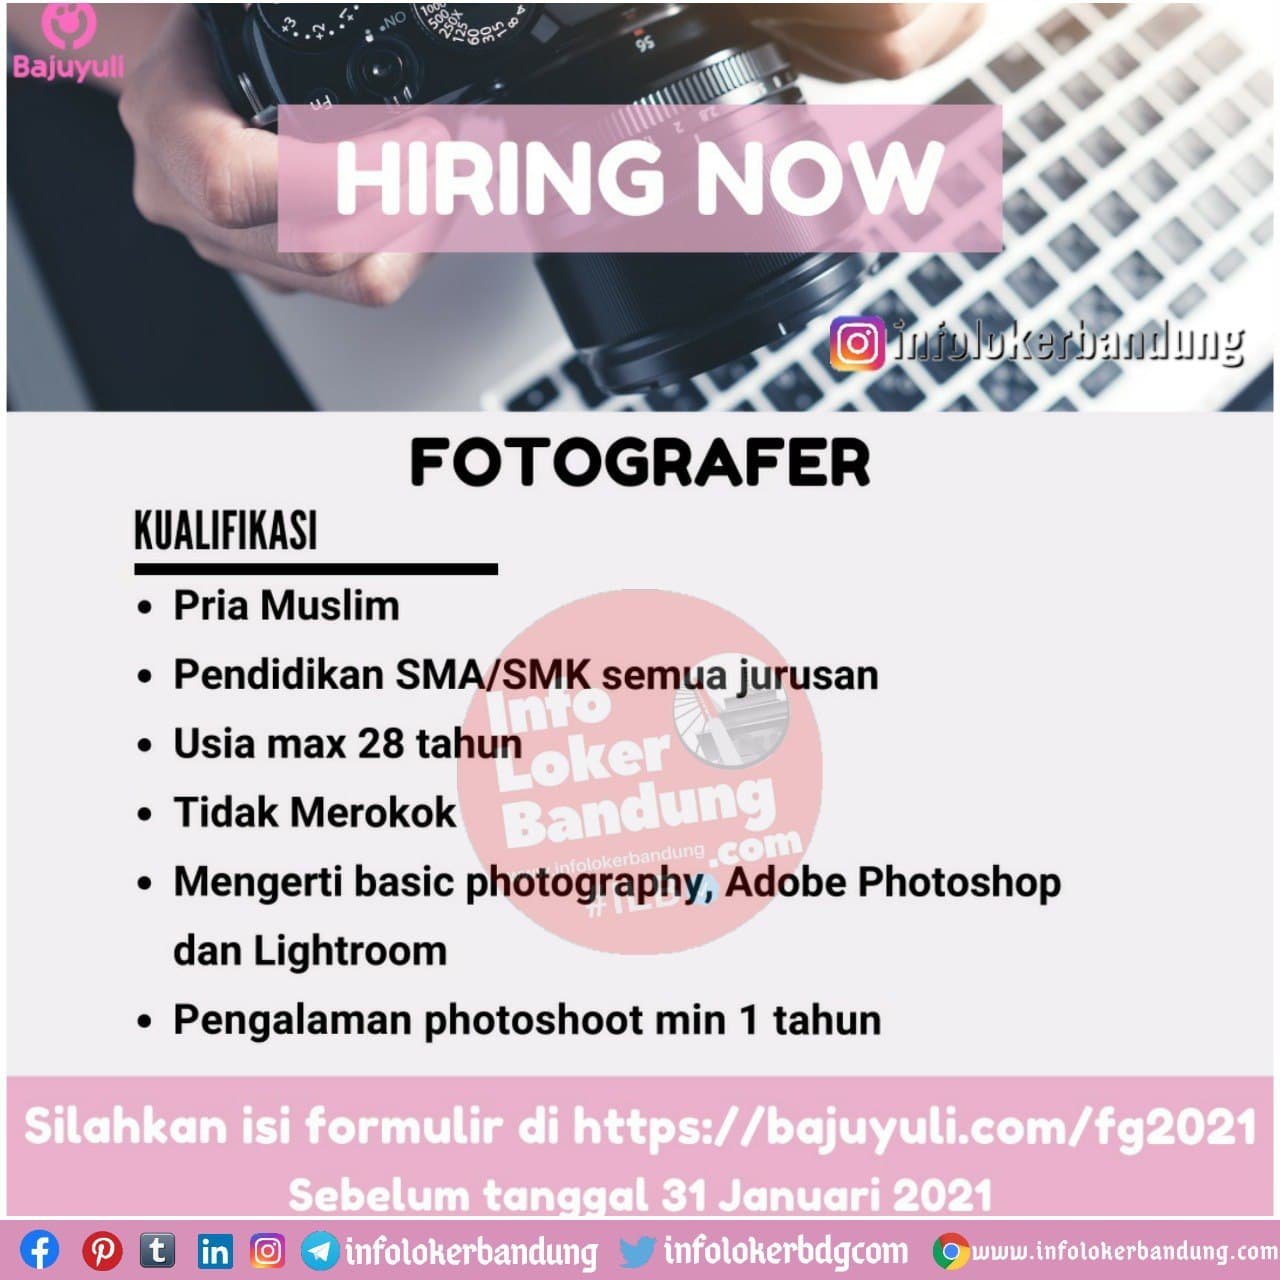 Lowongan Kerja Fotografer Bajuyuli Bandung Desember 2020 Info Loker Bandung 2021